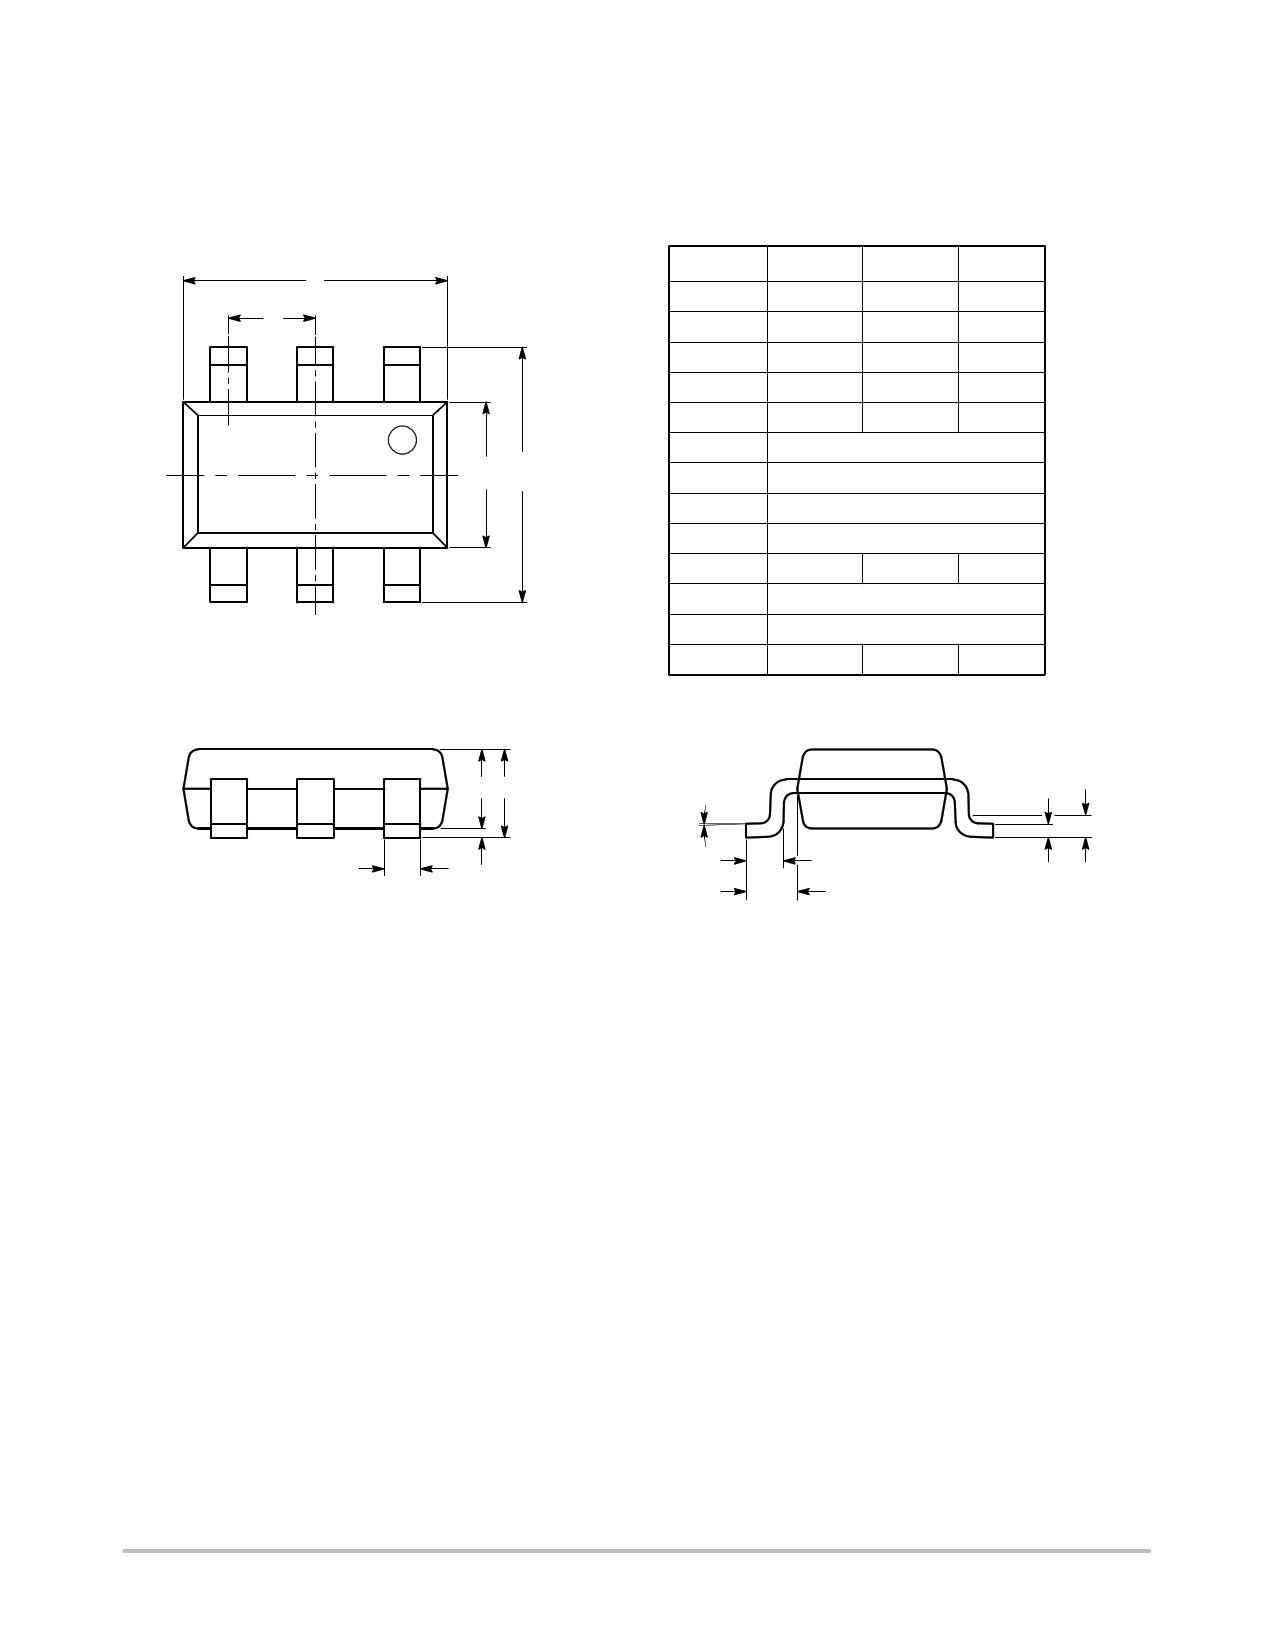 ASM3P2775A 電子部品, 半導体